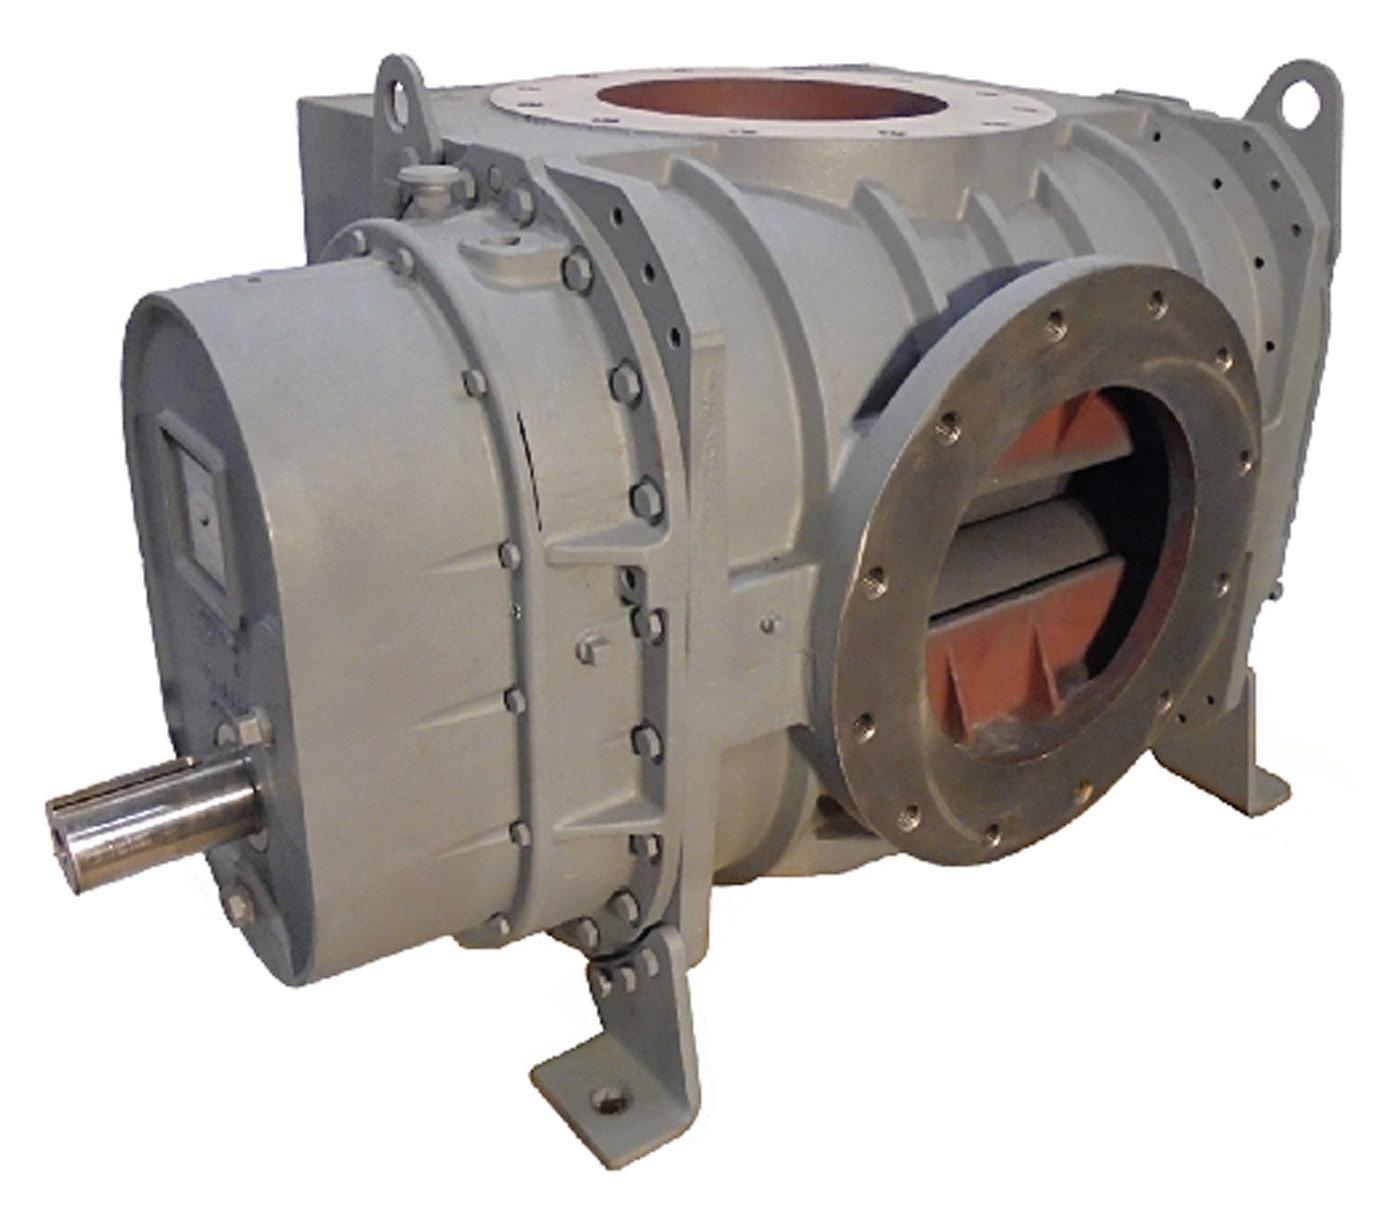 827 DVJ dry-vacuum blower from Howden